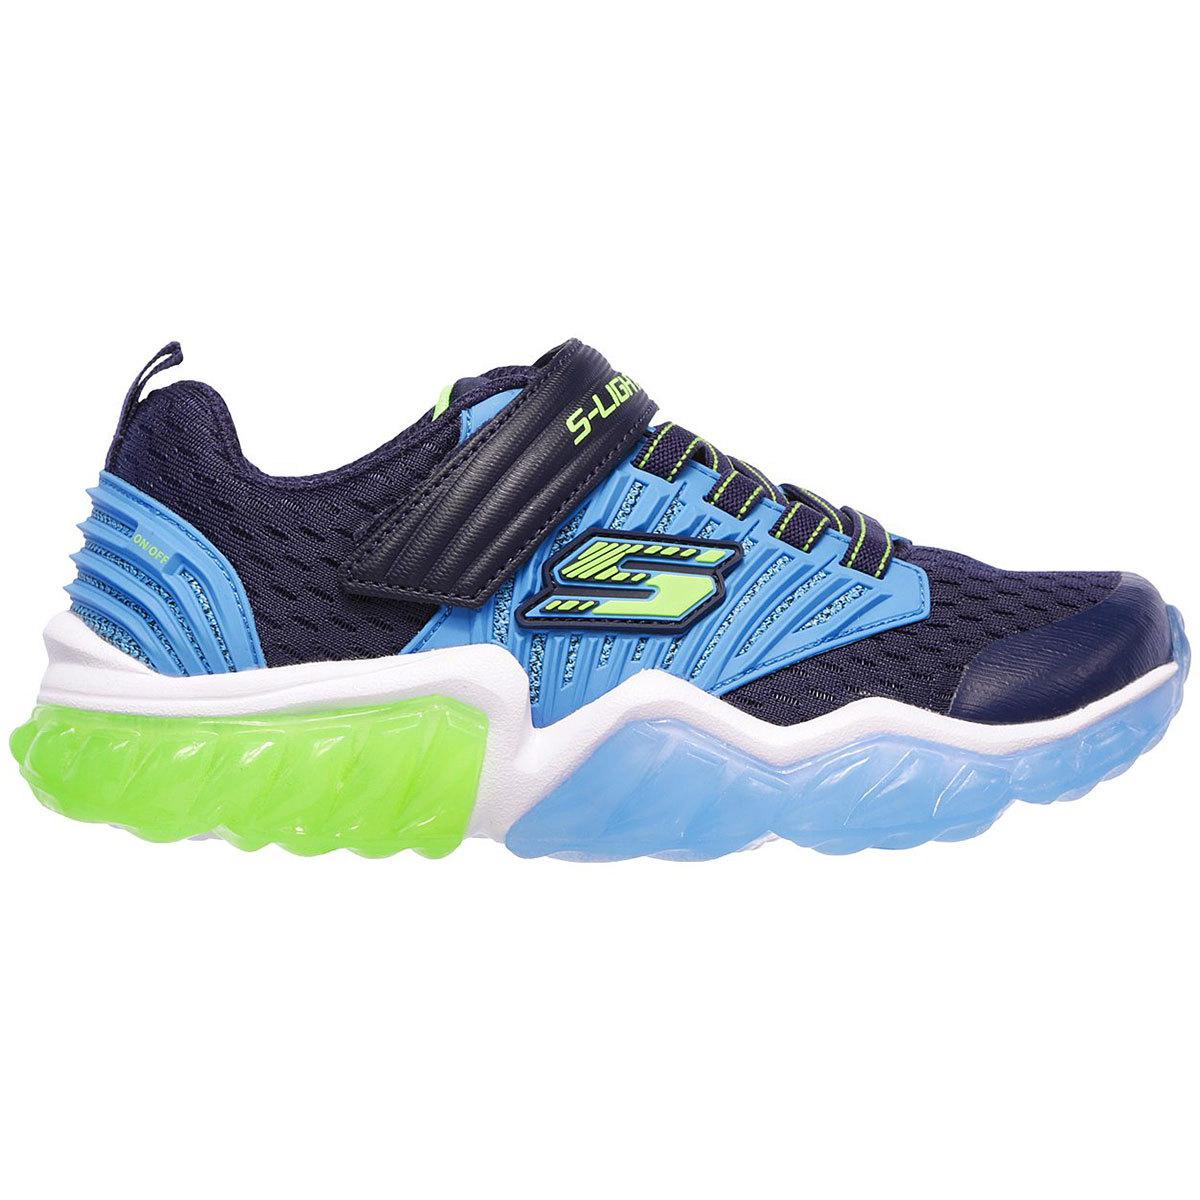 Skechers Boys' S Lights: Rapid Flash Sneakers - Blue, 1